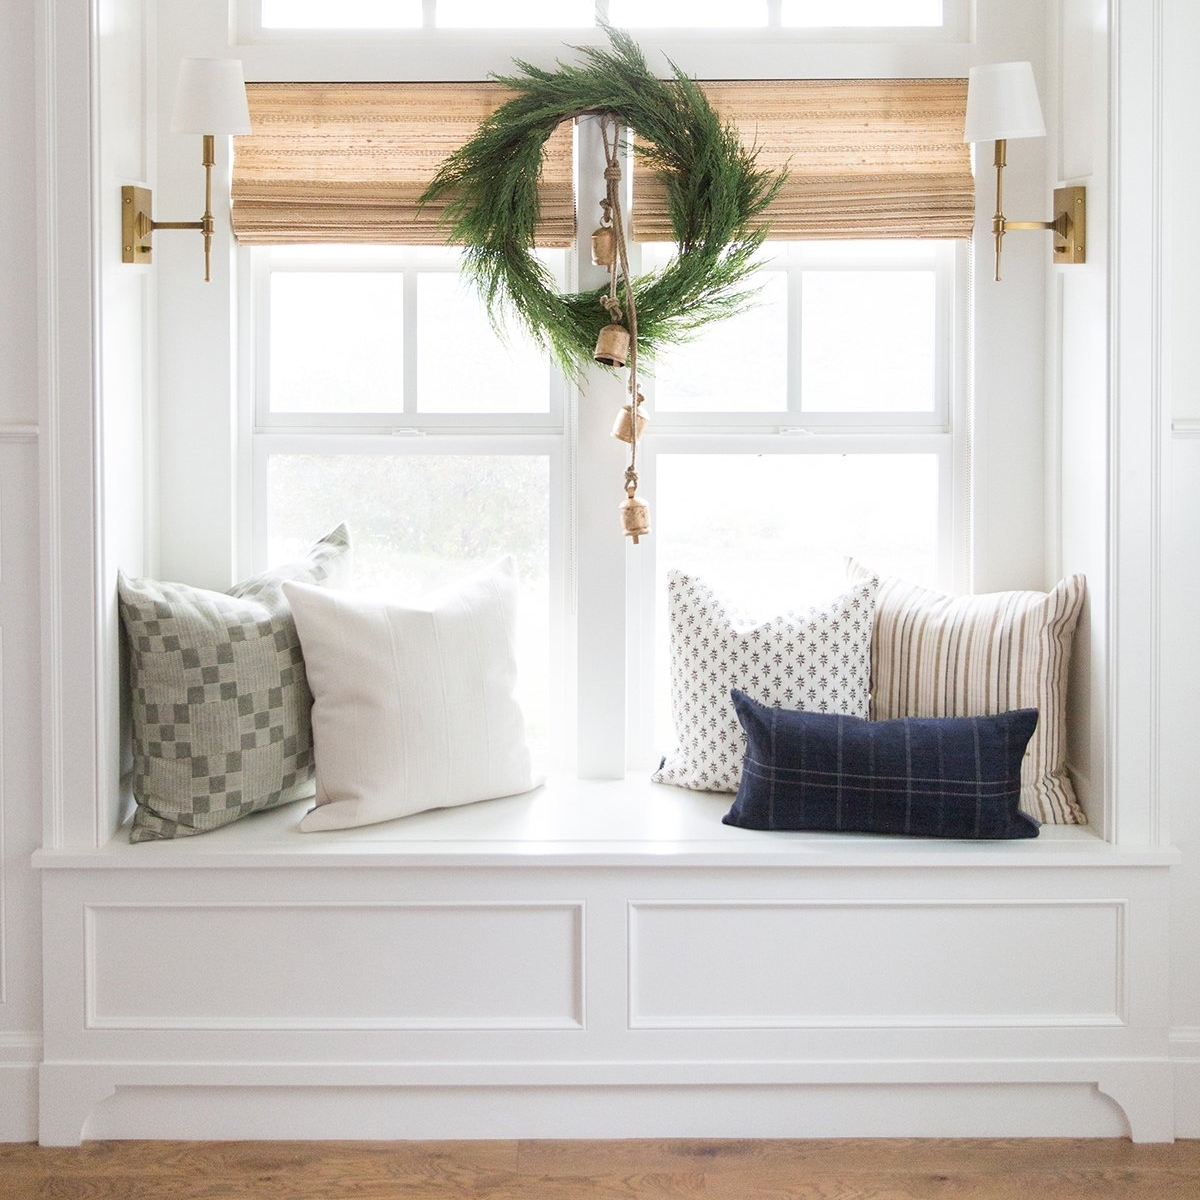 WindowSeat_Holiday.jpg